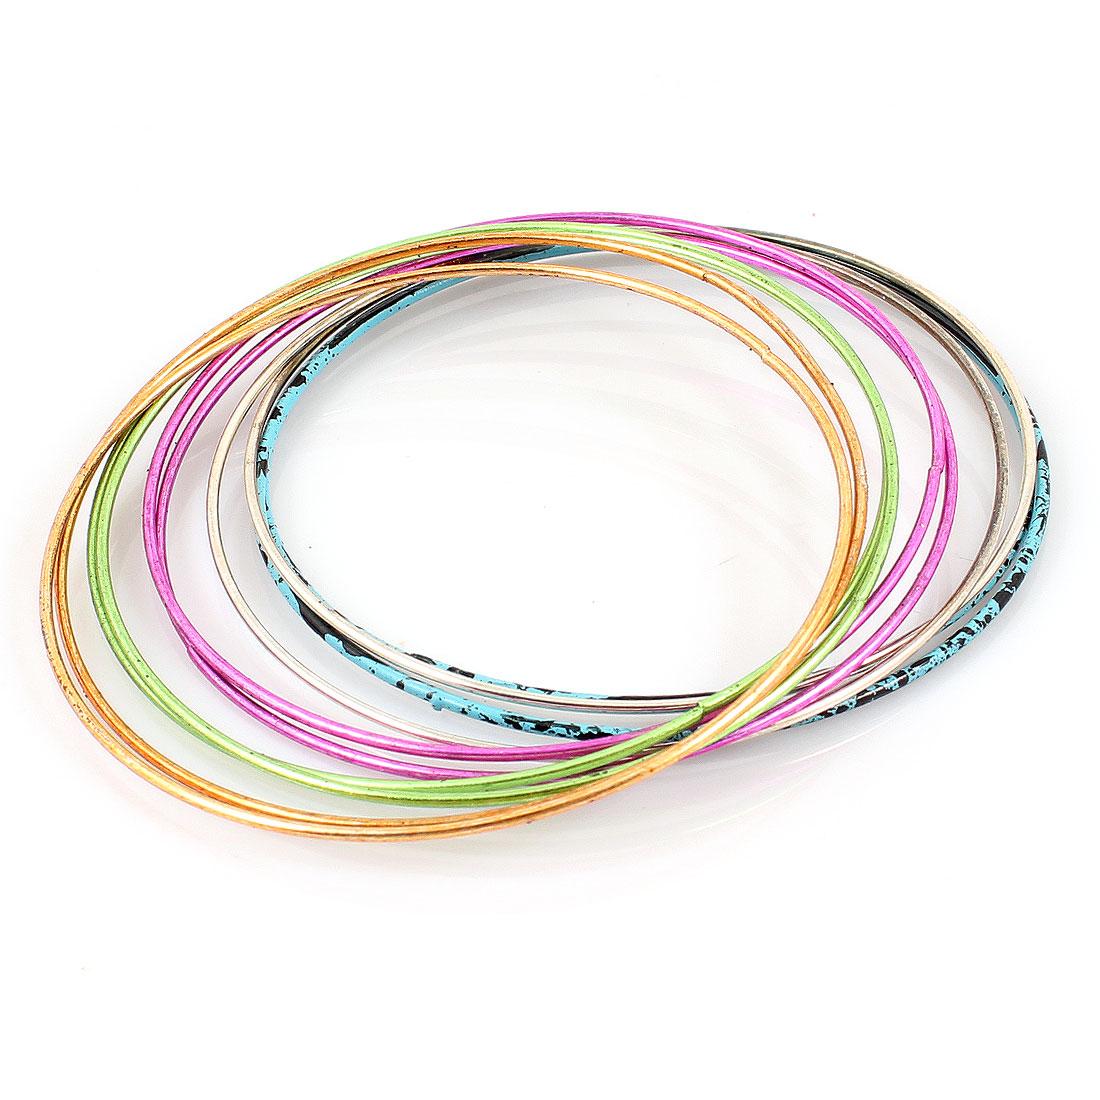 6.5cm Dia Lady Ornament Colored Metal Loop Wrist Bracelet Bangle 10pcs